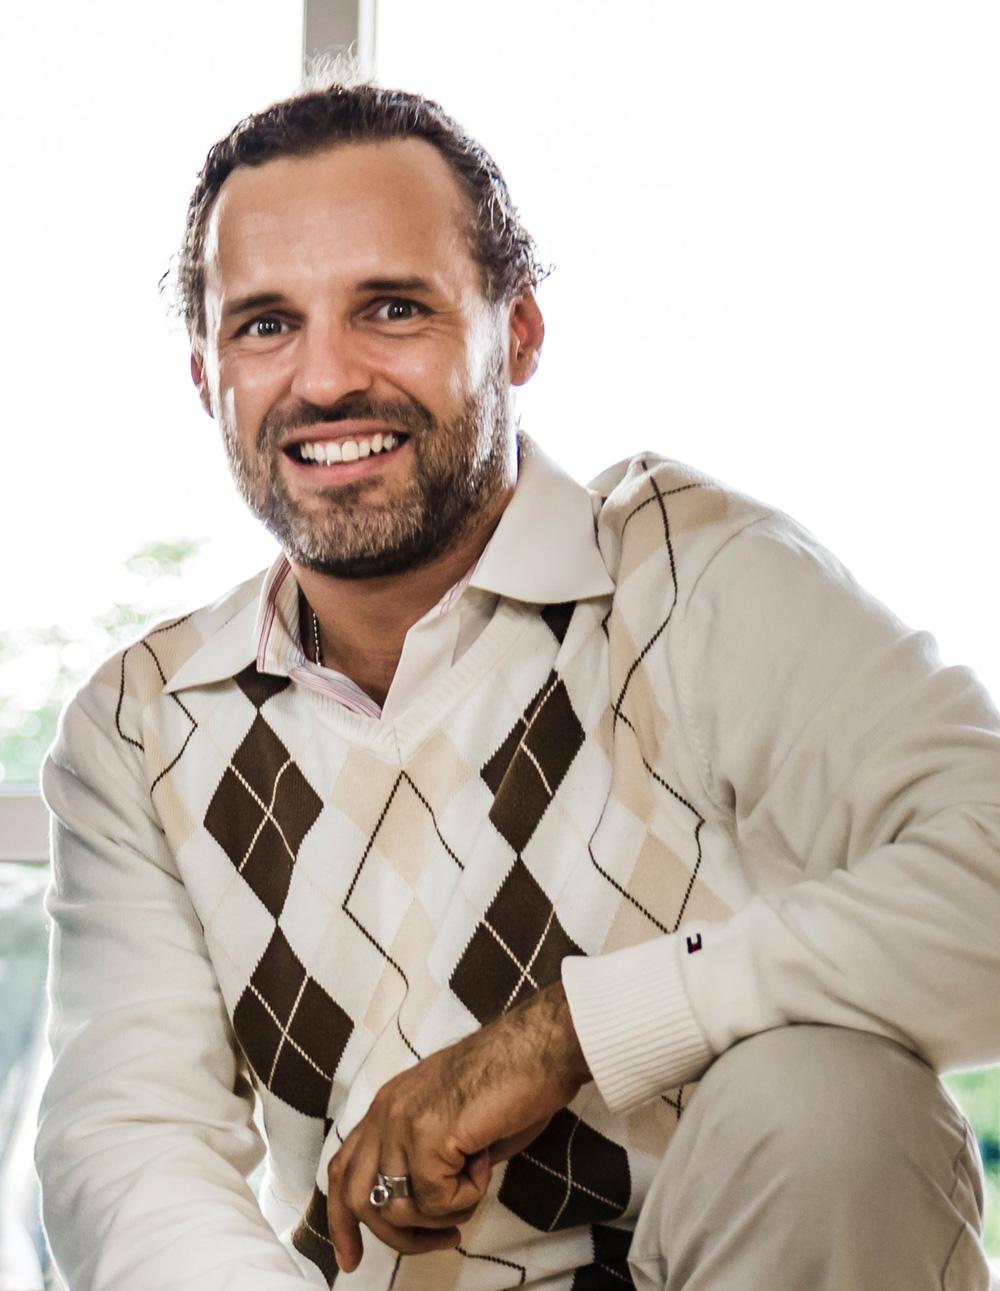 Armando Sommer Profilbild-Armando-Verano